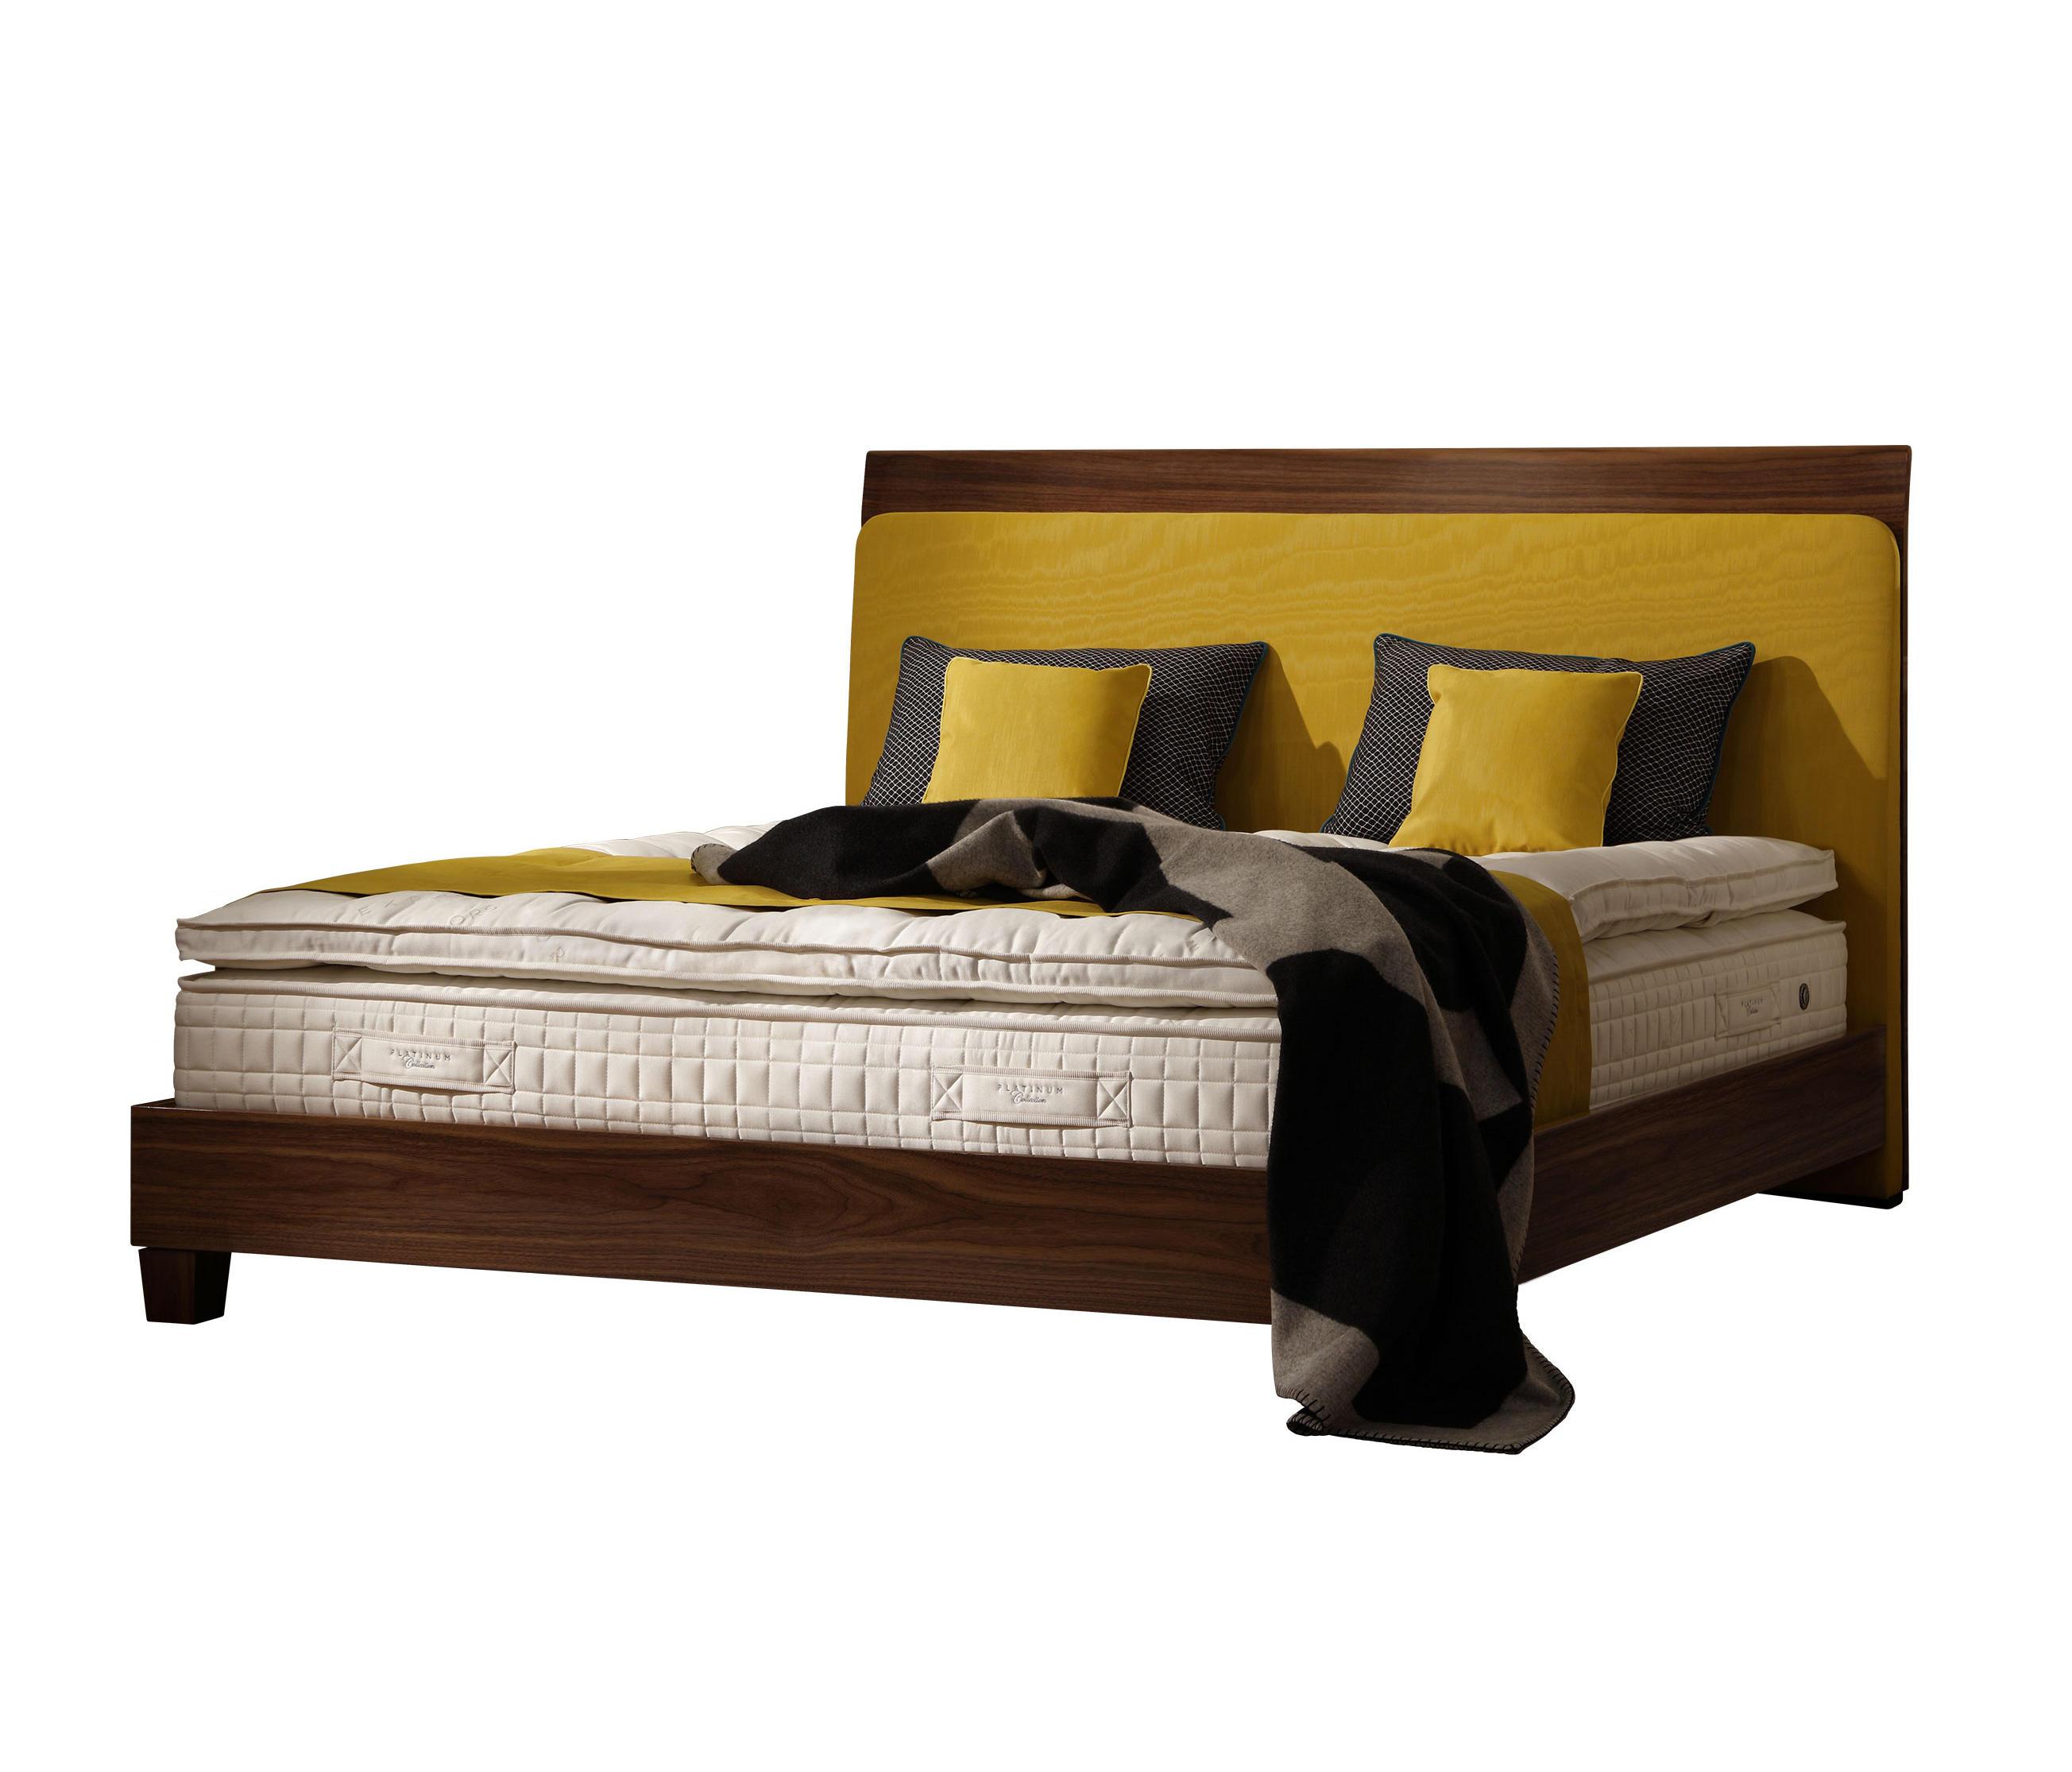 Sleeping Systems Collection Platinum | Headboard Saint Germain Brut By  Treca Paris | Bed Headboards